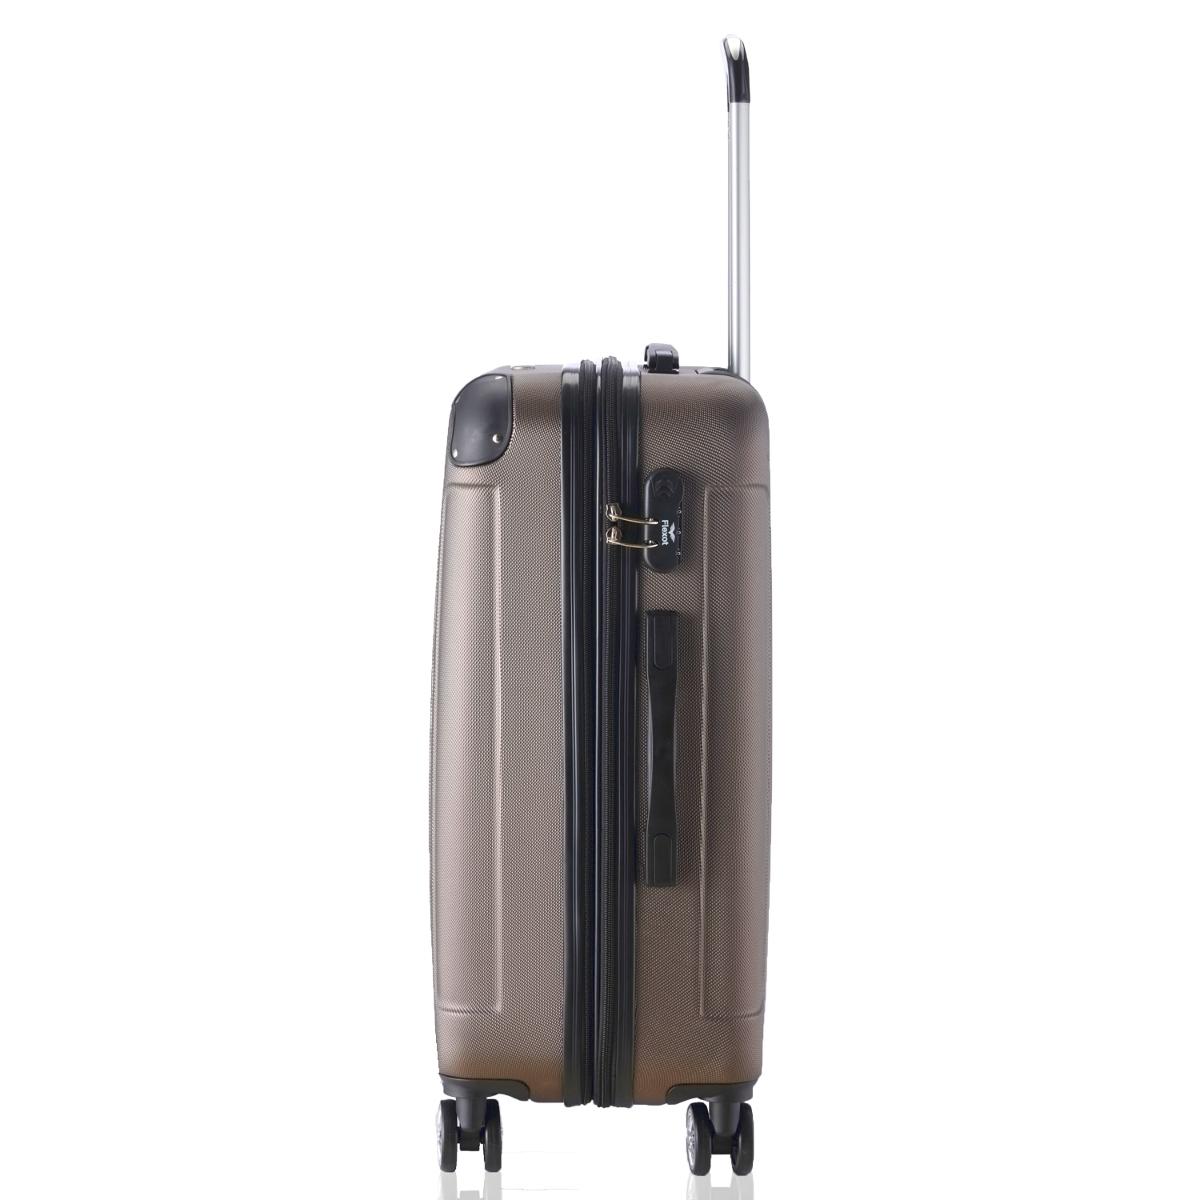 Koffer-Flexot-2045-Hartschalenkoffer-Trolley-Kofferset-Reisekoffer-M-L-XL-Set Indexbild 59